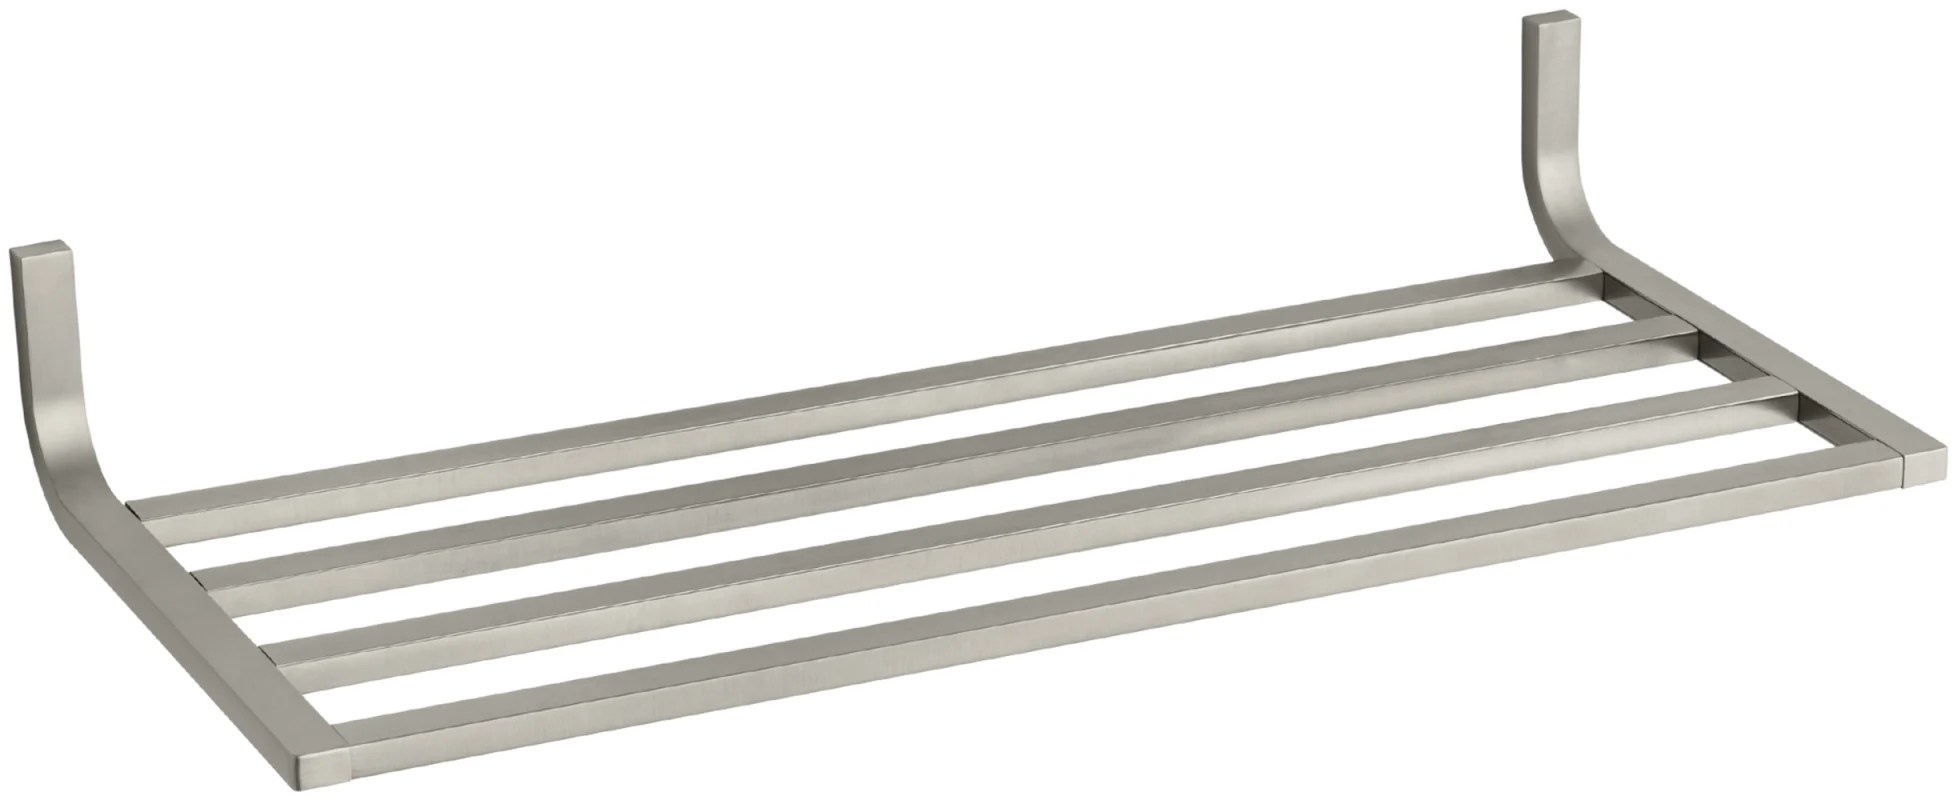 Kohler K Bn Brushed Nickel Modern Metal Towel Shelf